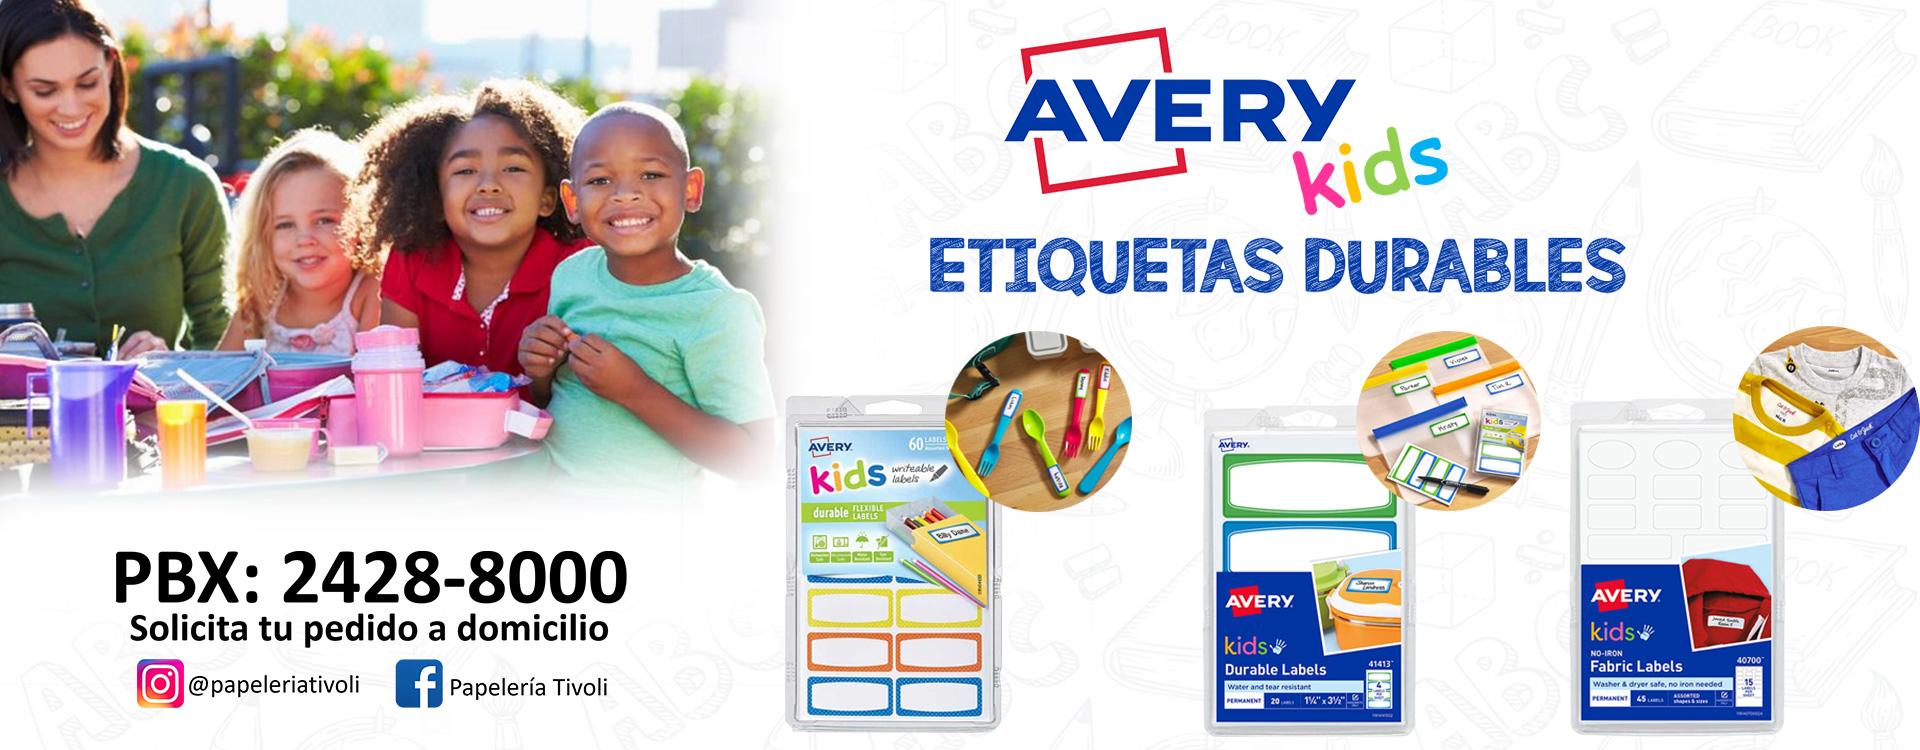 Banner-etiquetas-durables-Avery